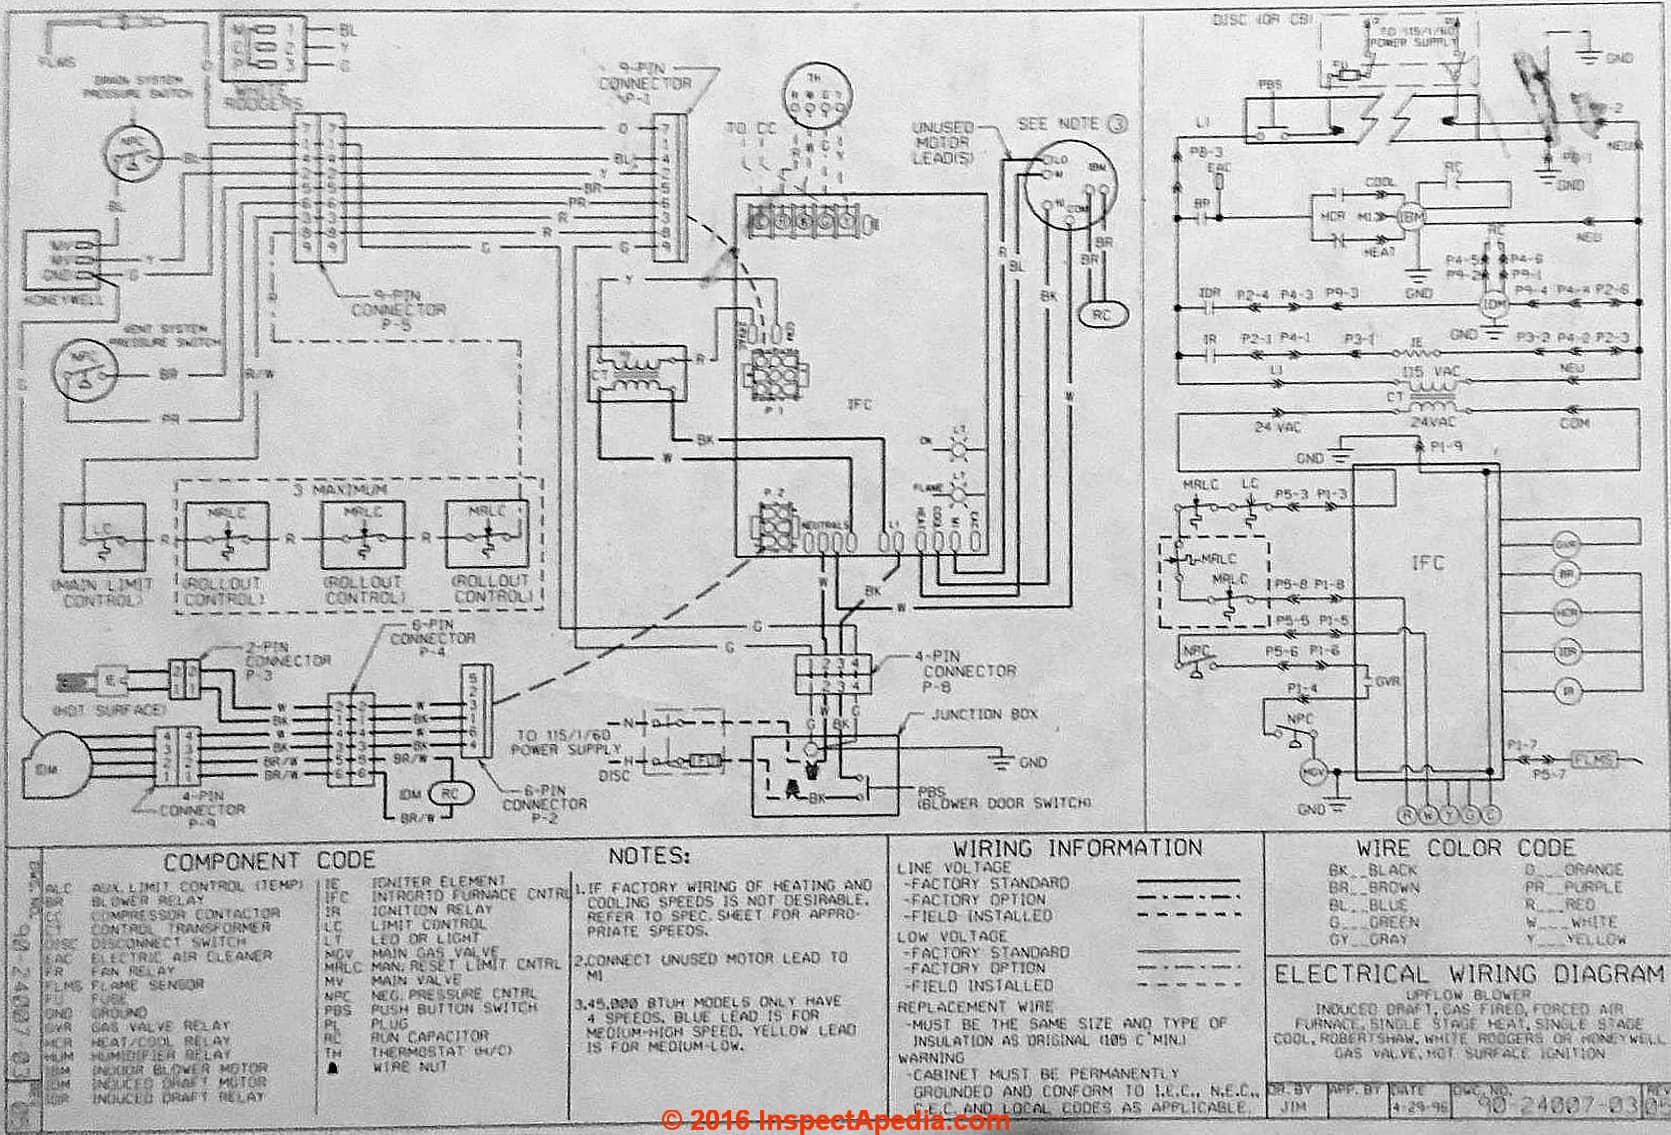 Rheem_AHU_Wiring_Diagram_IAP?resize\\\=840%2C571\\\&ssl\\\=1 mcquay heat pump wiring diagram schematic diagrams